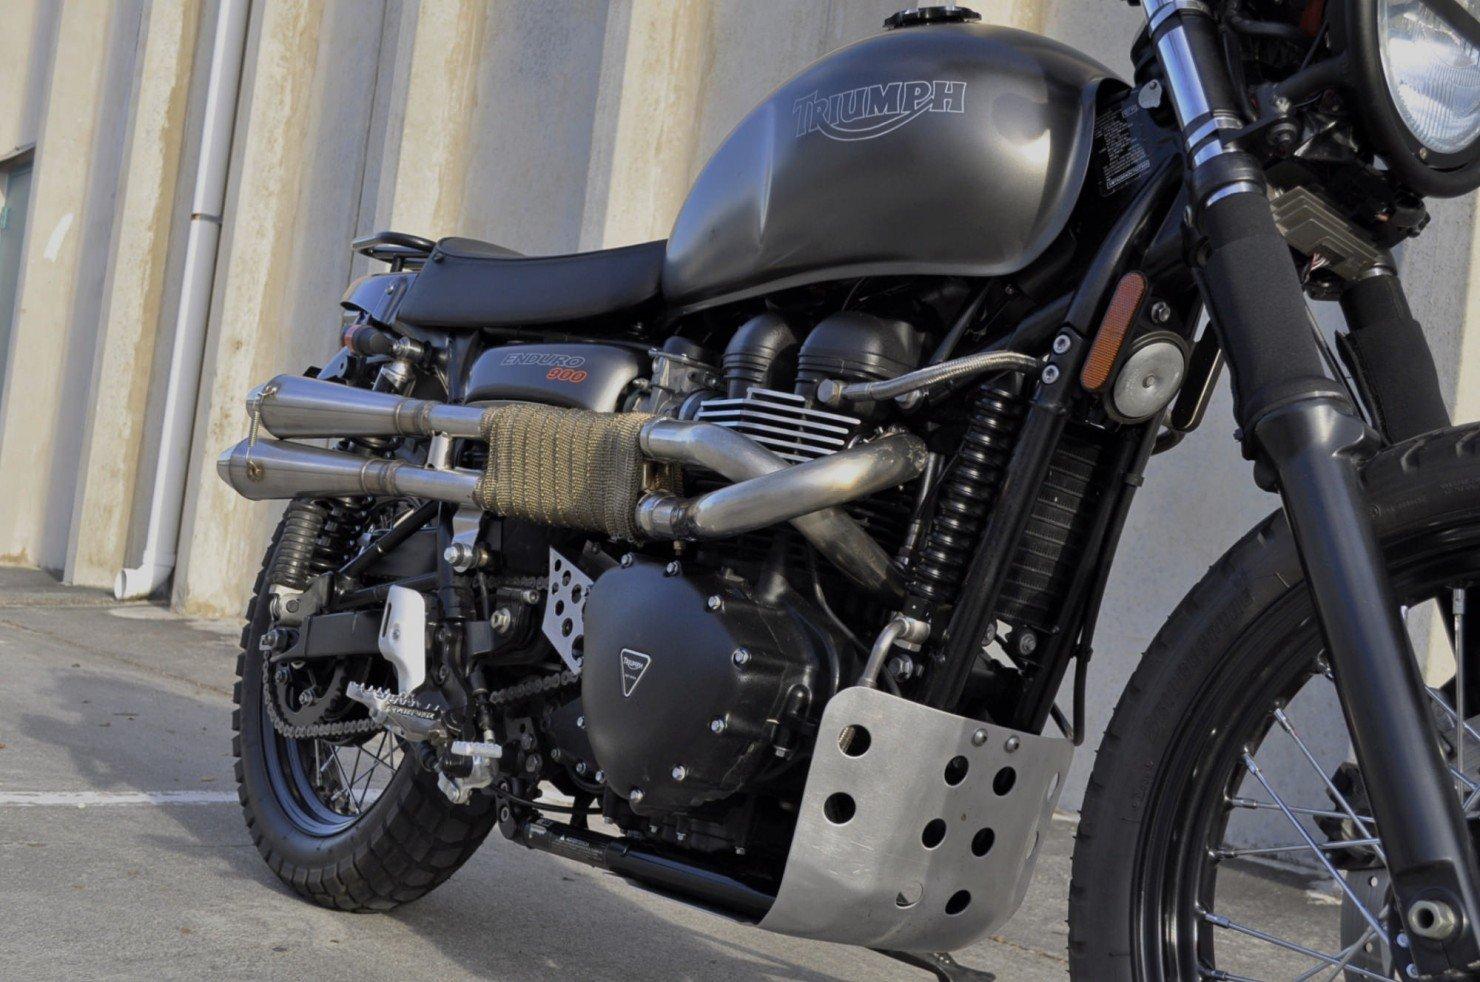 triumph_enduro_motorcycle_4